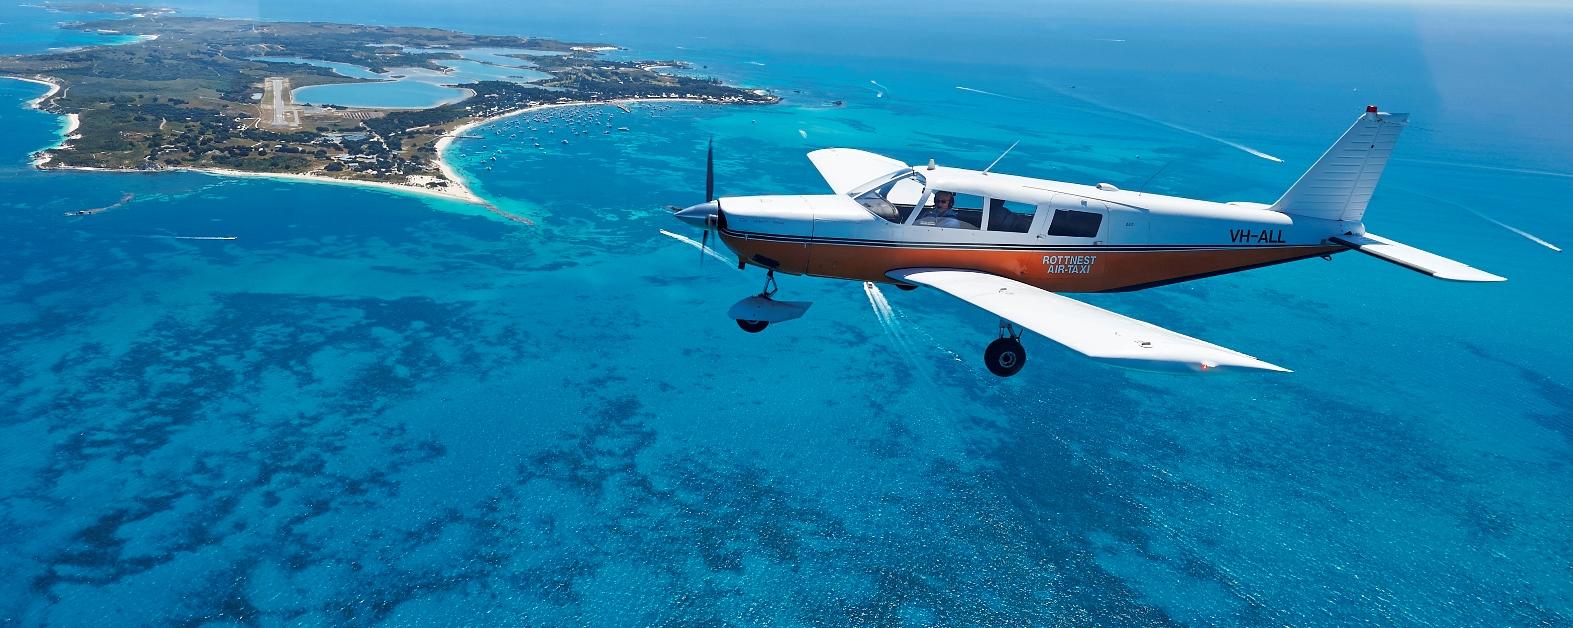 Rottnest Scenic Flight